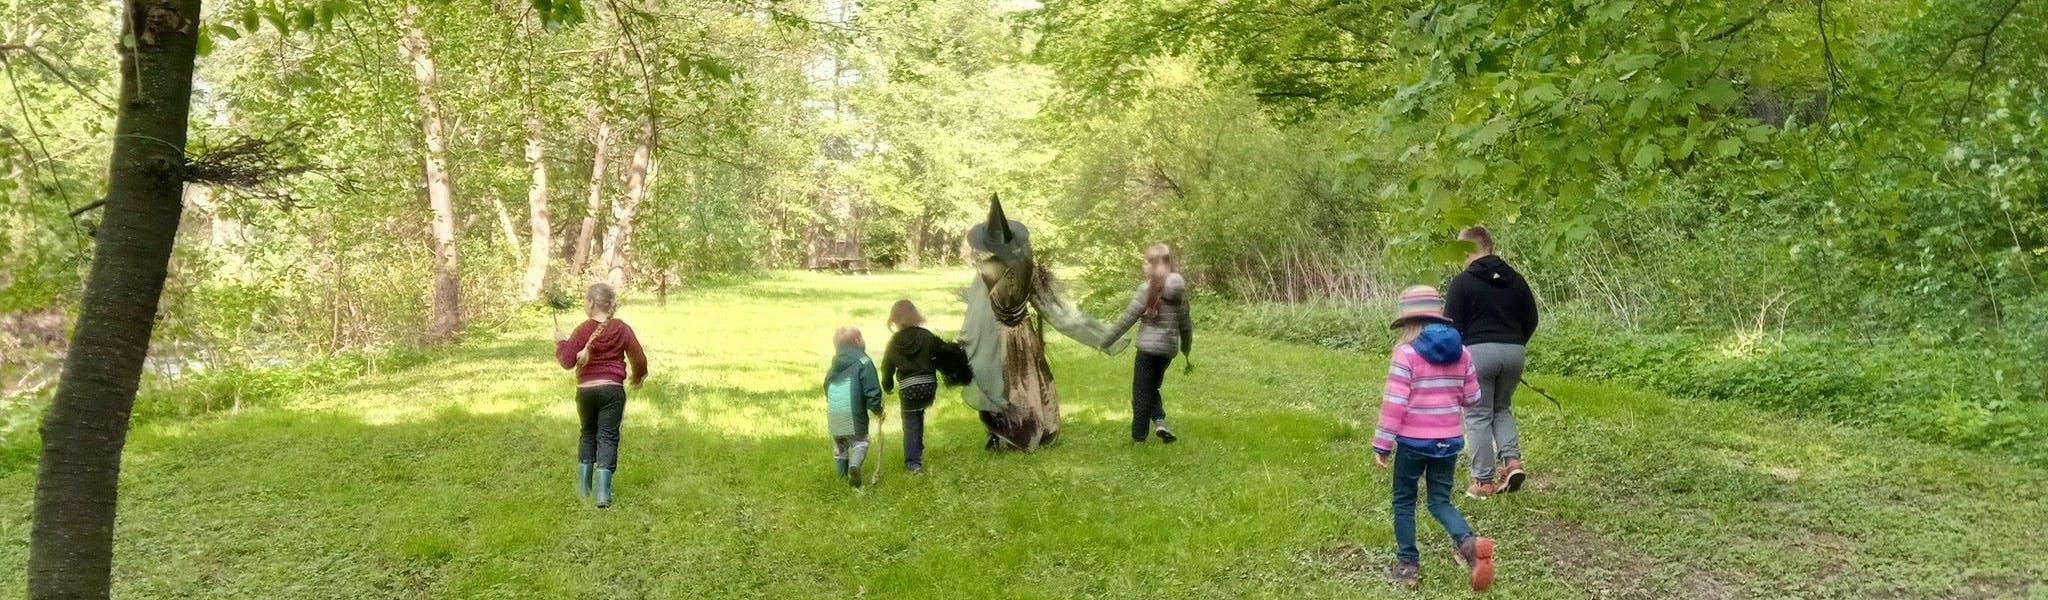 Wandeling met animatie camping Walkenried